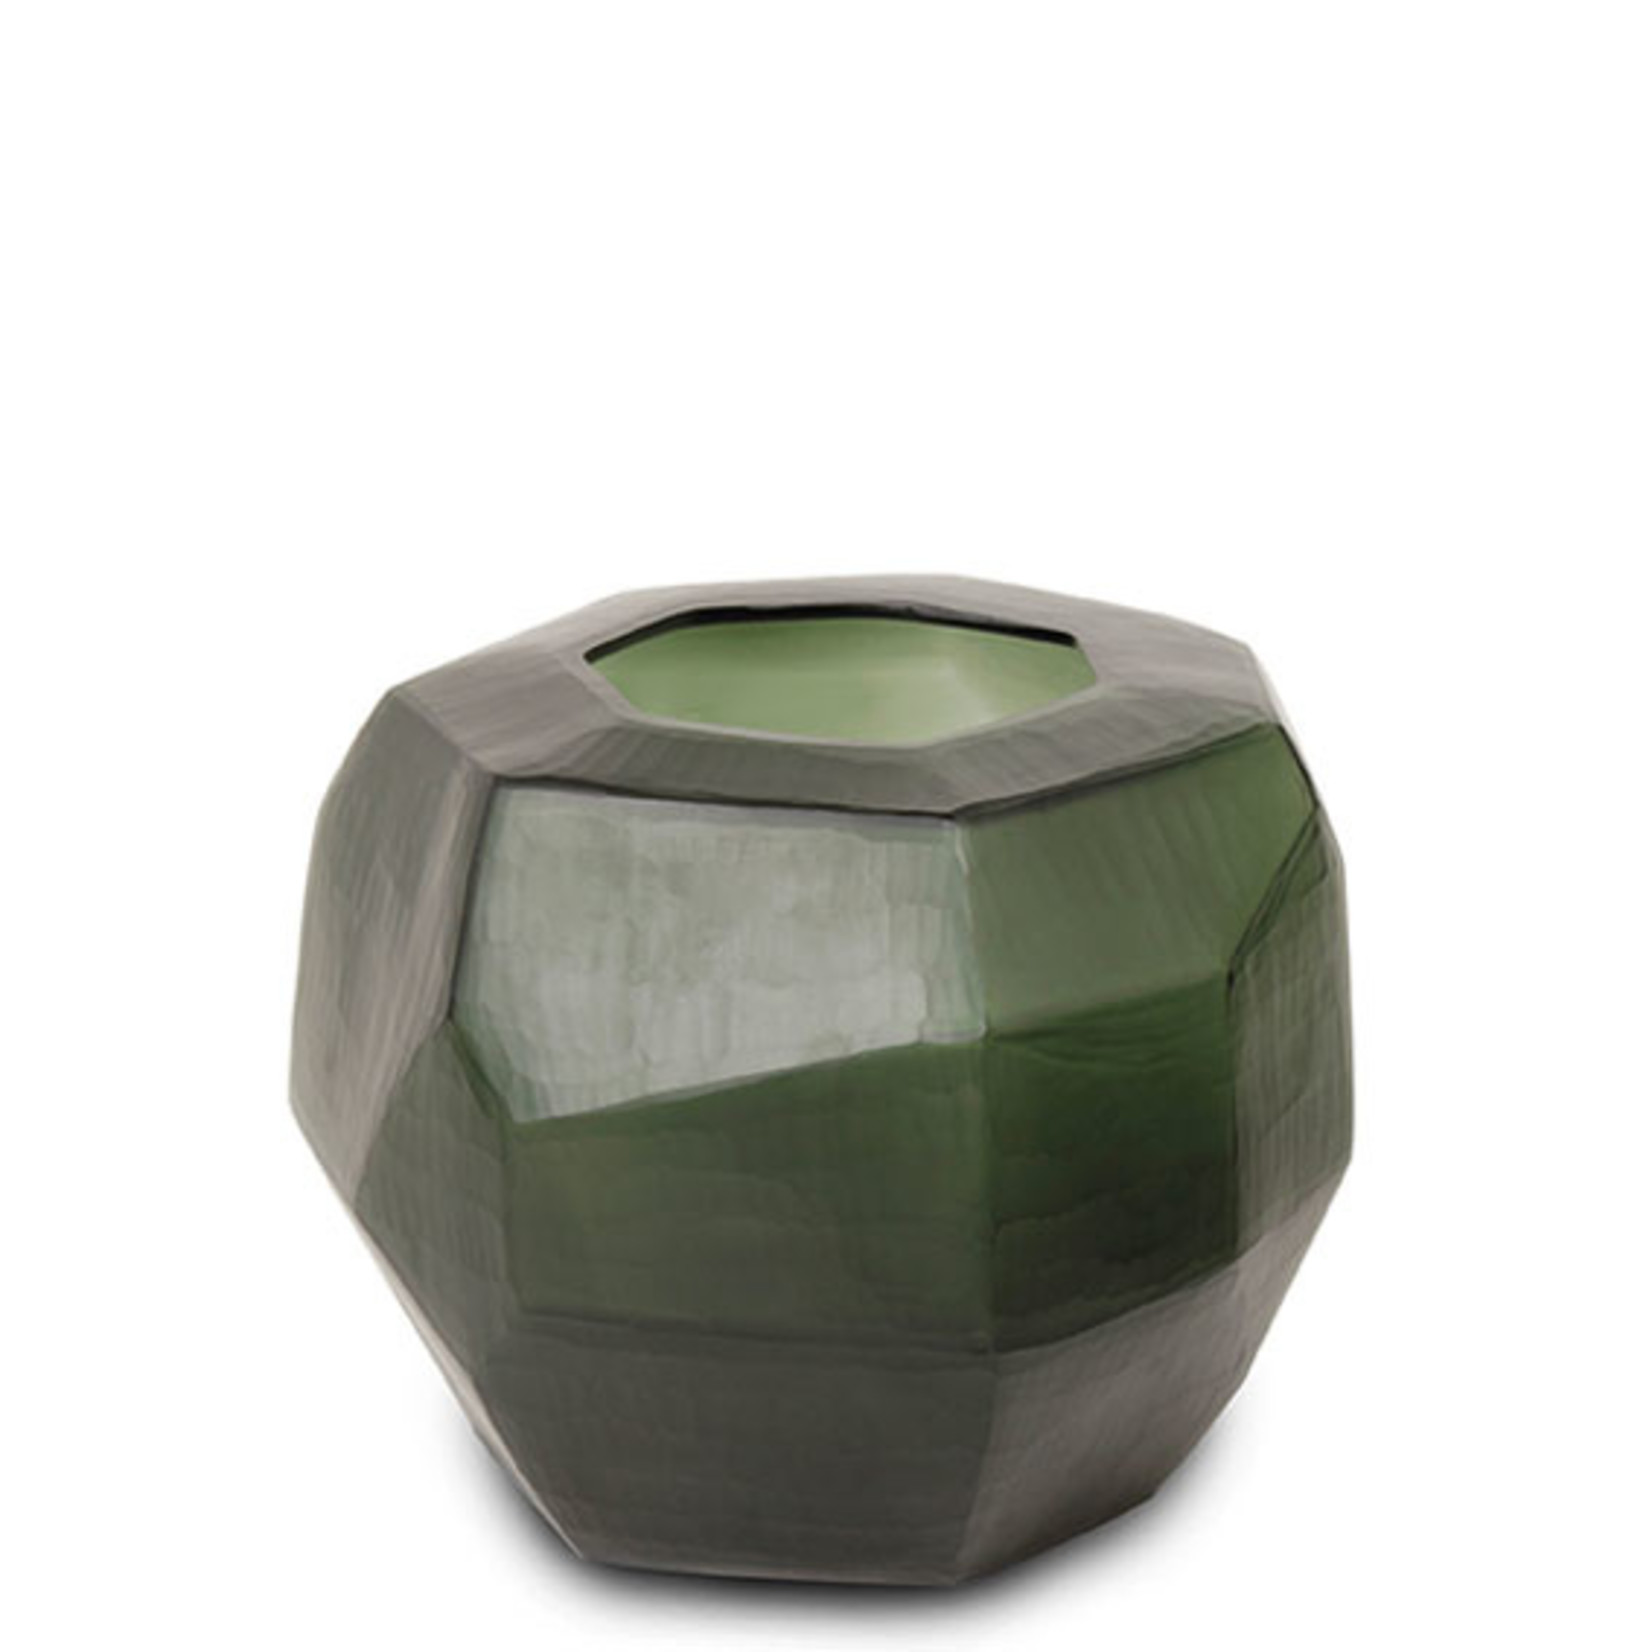 Guaxs Vaas Cubistic Round | Black / Steelgrey